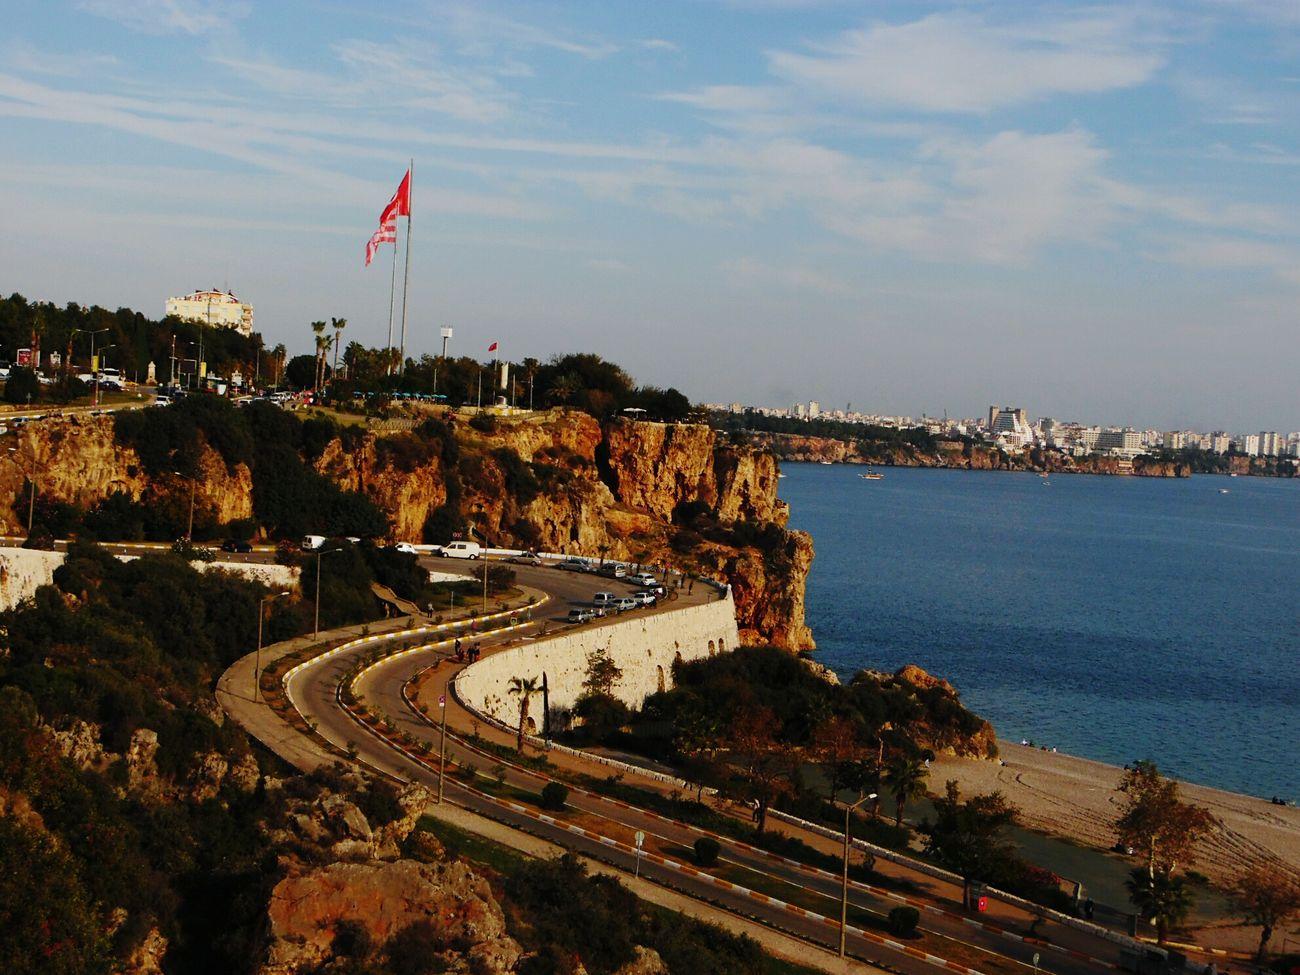 Antalya Turkey Samsung WB1100F Samsung Smart Camera Eyeem Turkey Eyemphotography View View Collection